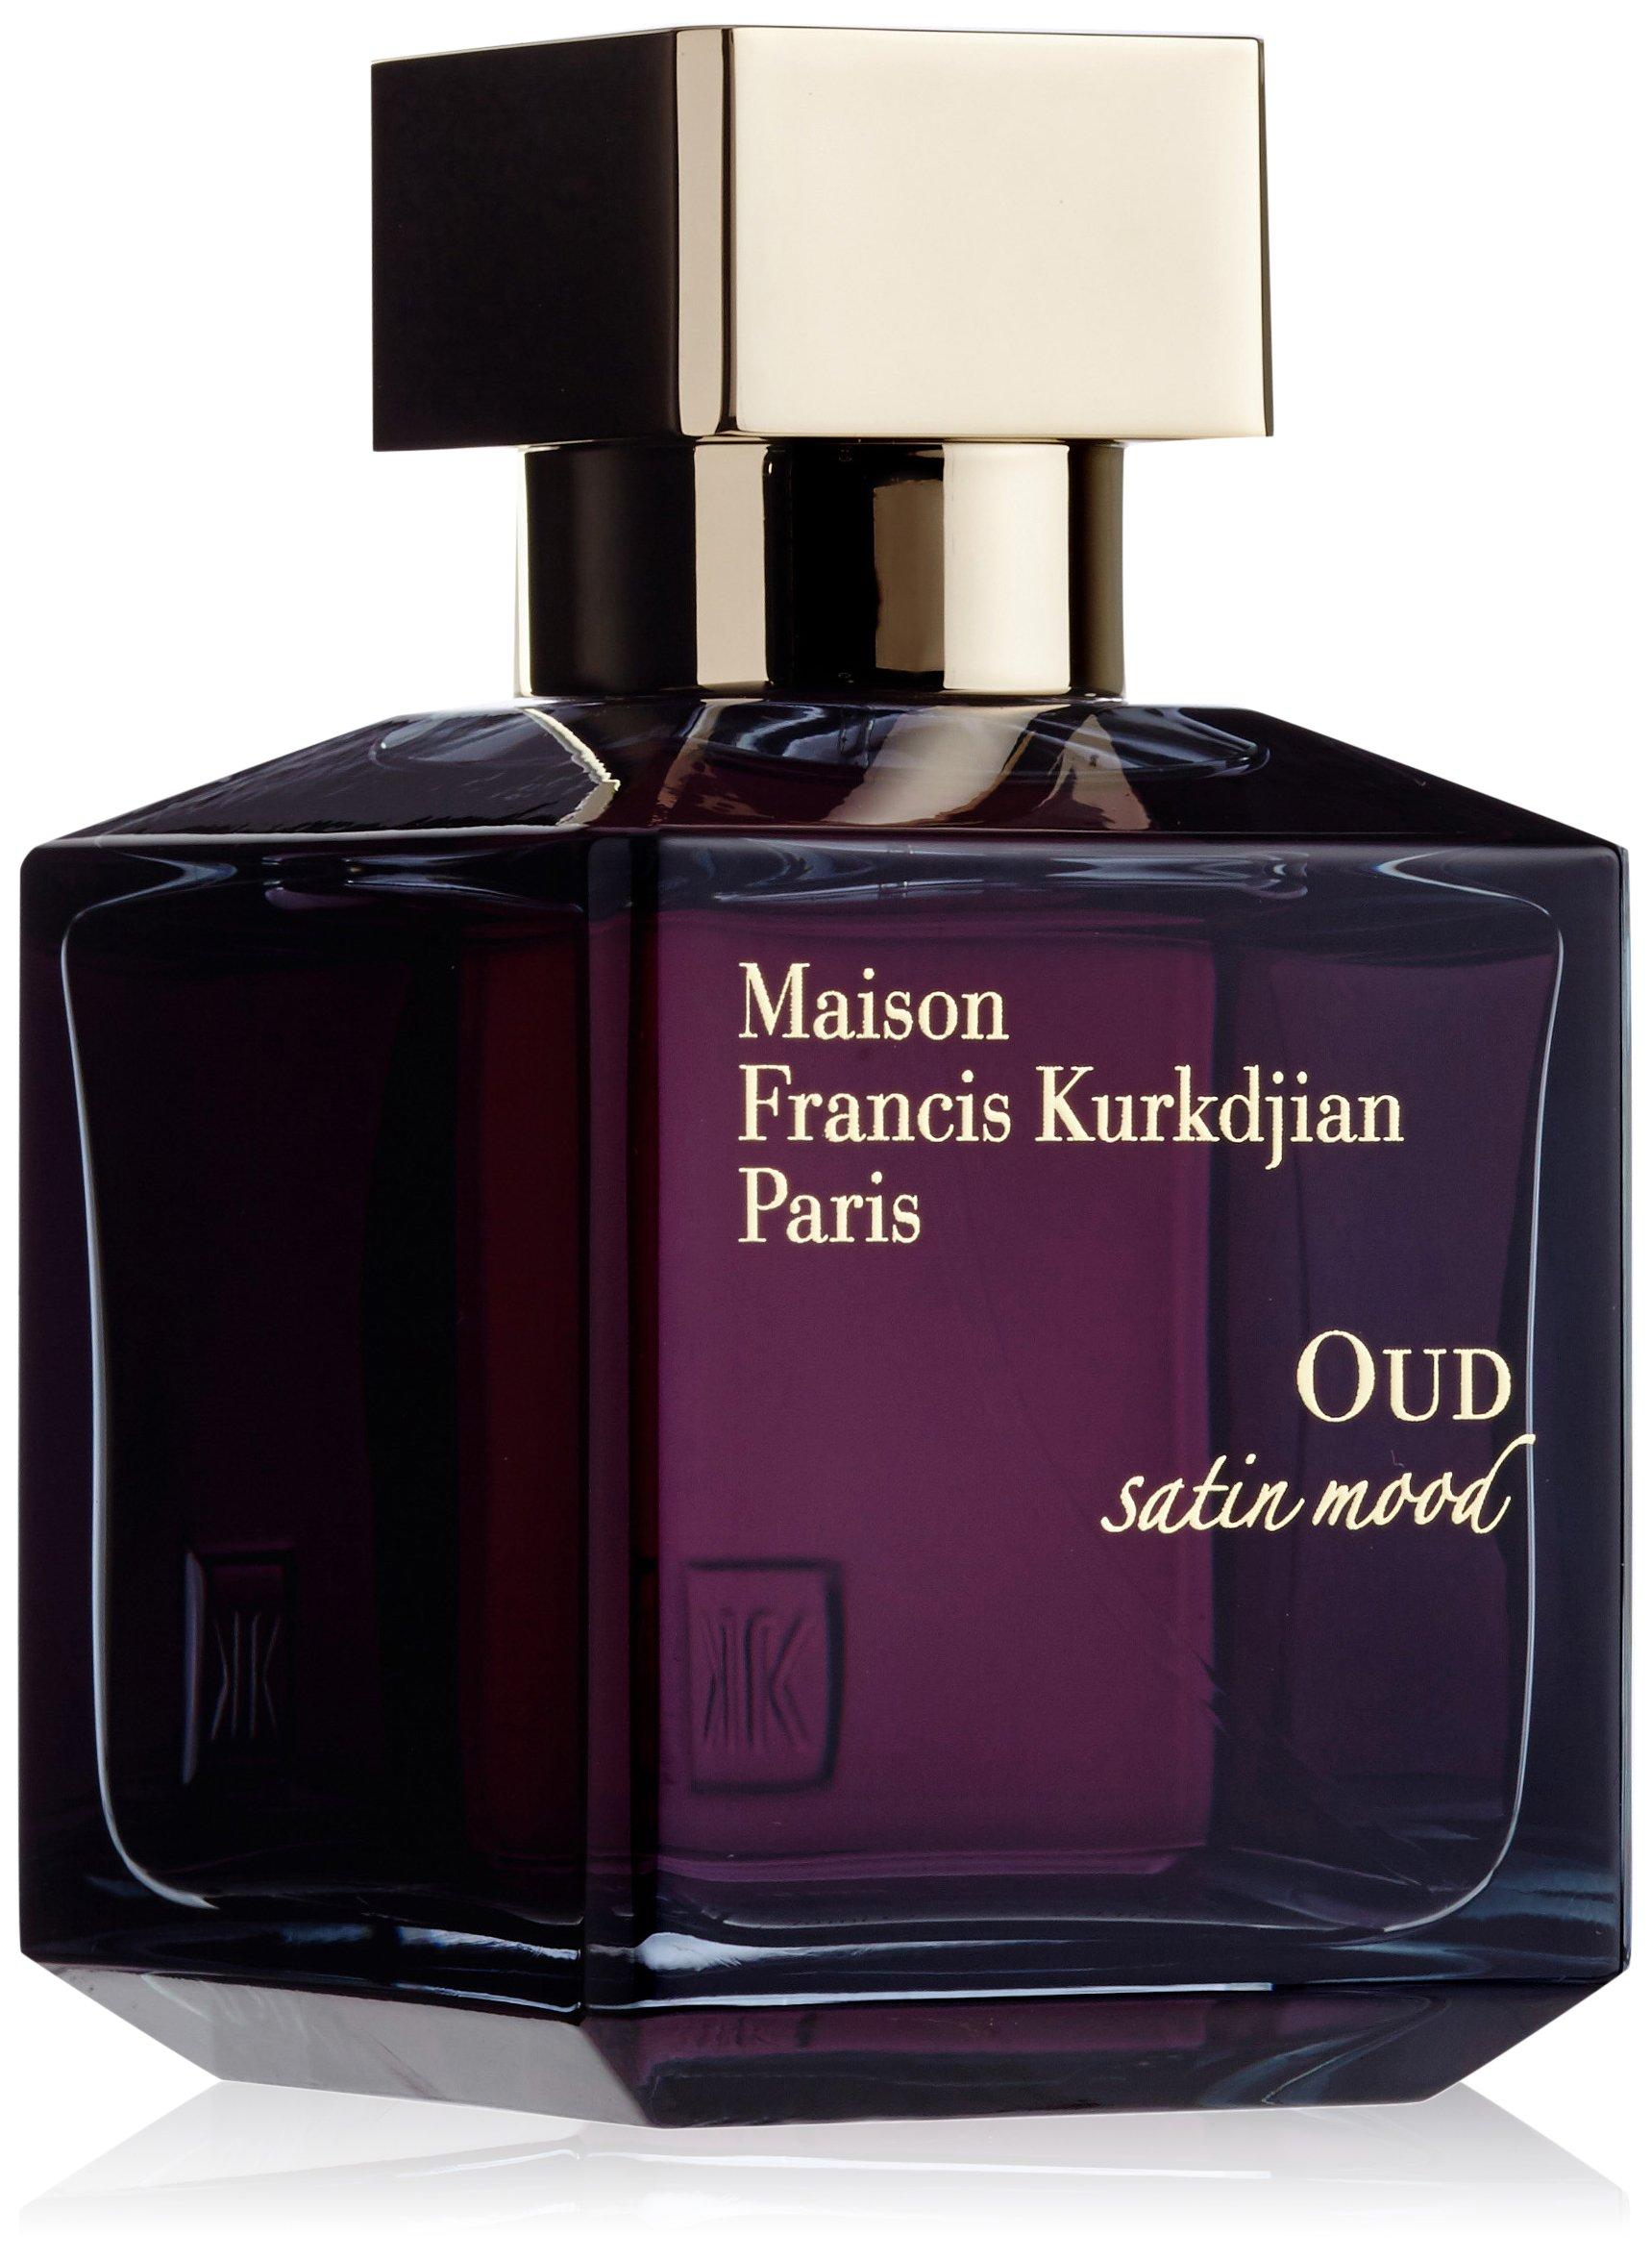 Maison Francis Kurkdjian Oud Satin Mood Eau De Parfum Spray 70ml/2.4oz